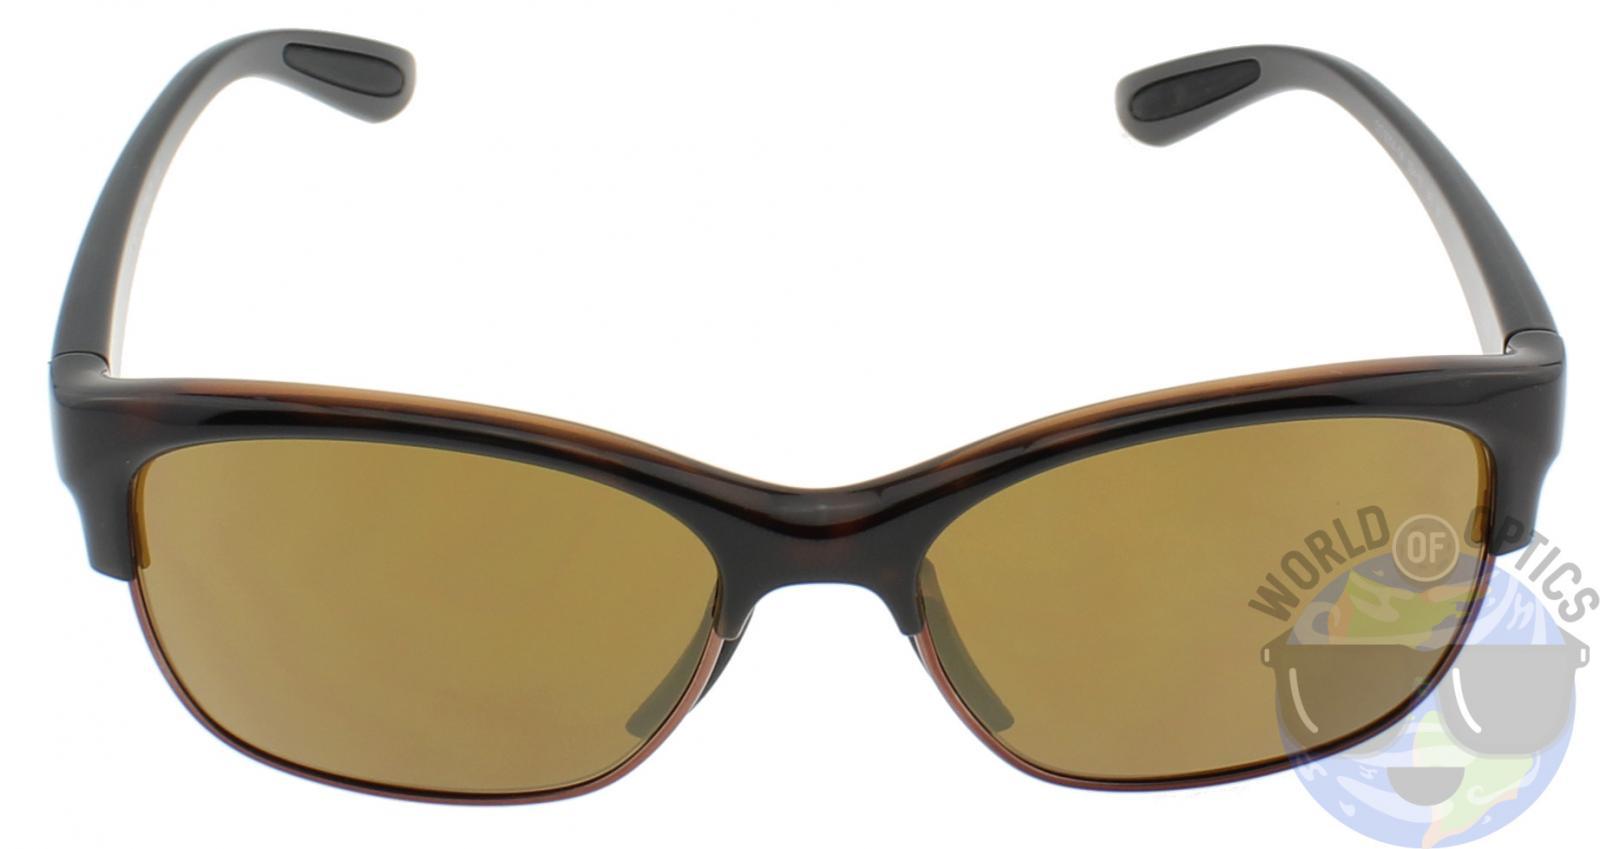 fef3f9abb2 Oakley Ansi Z87 1 Sunglasses « Heritage Malta